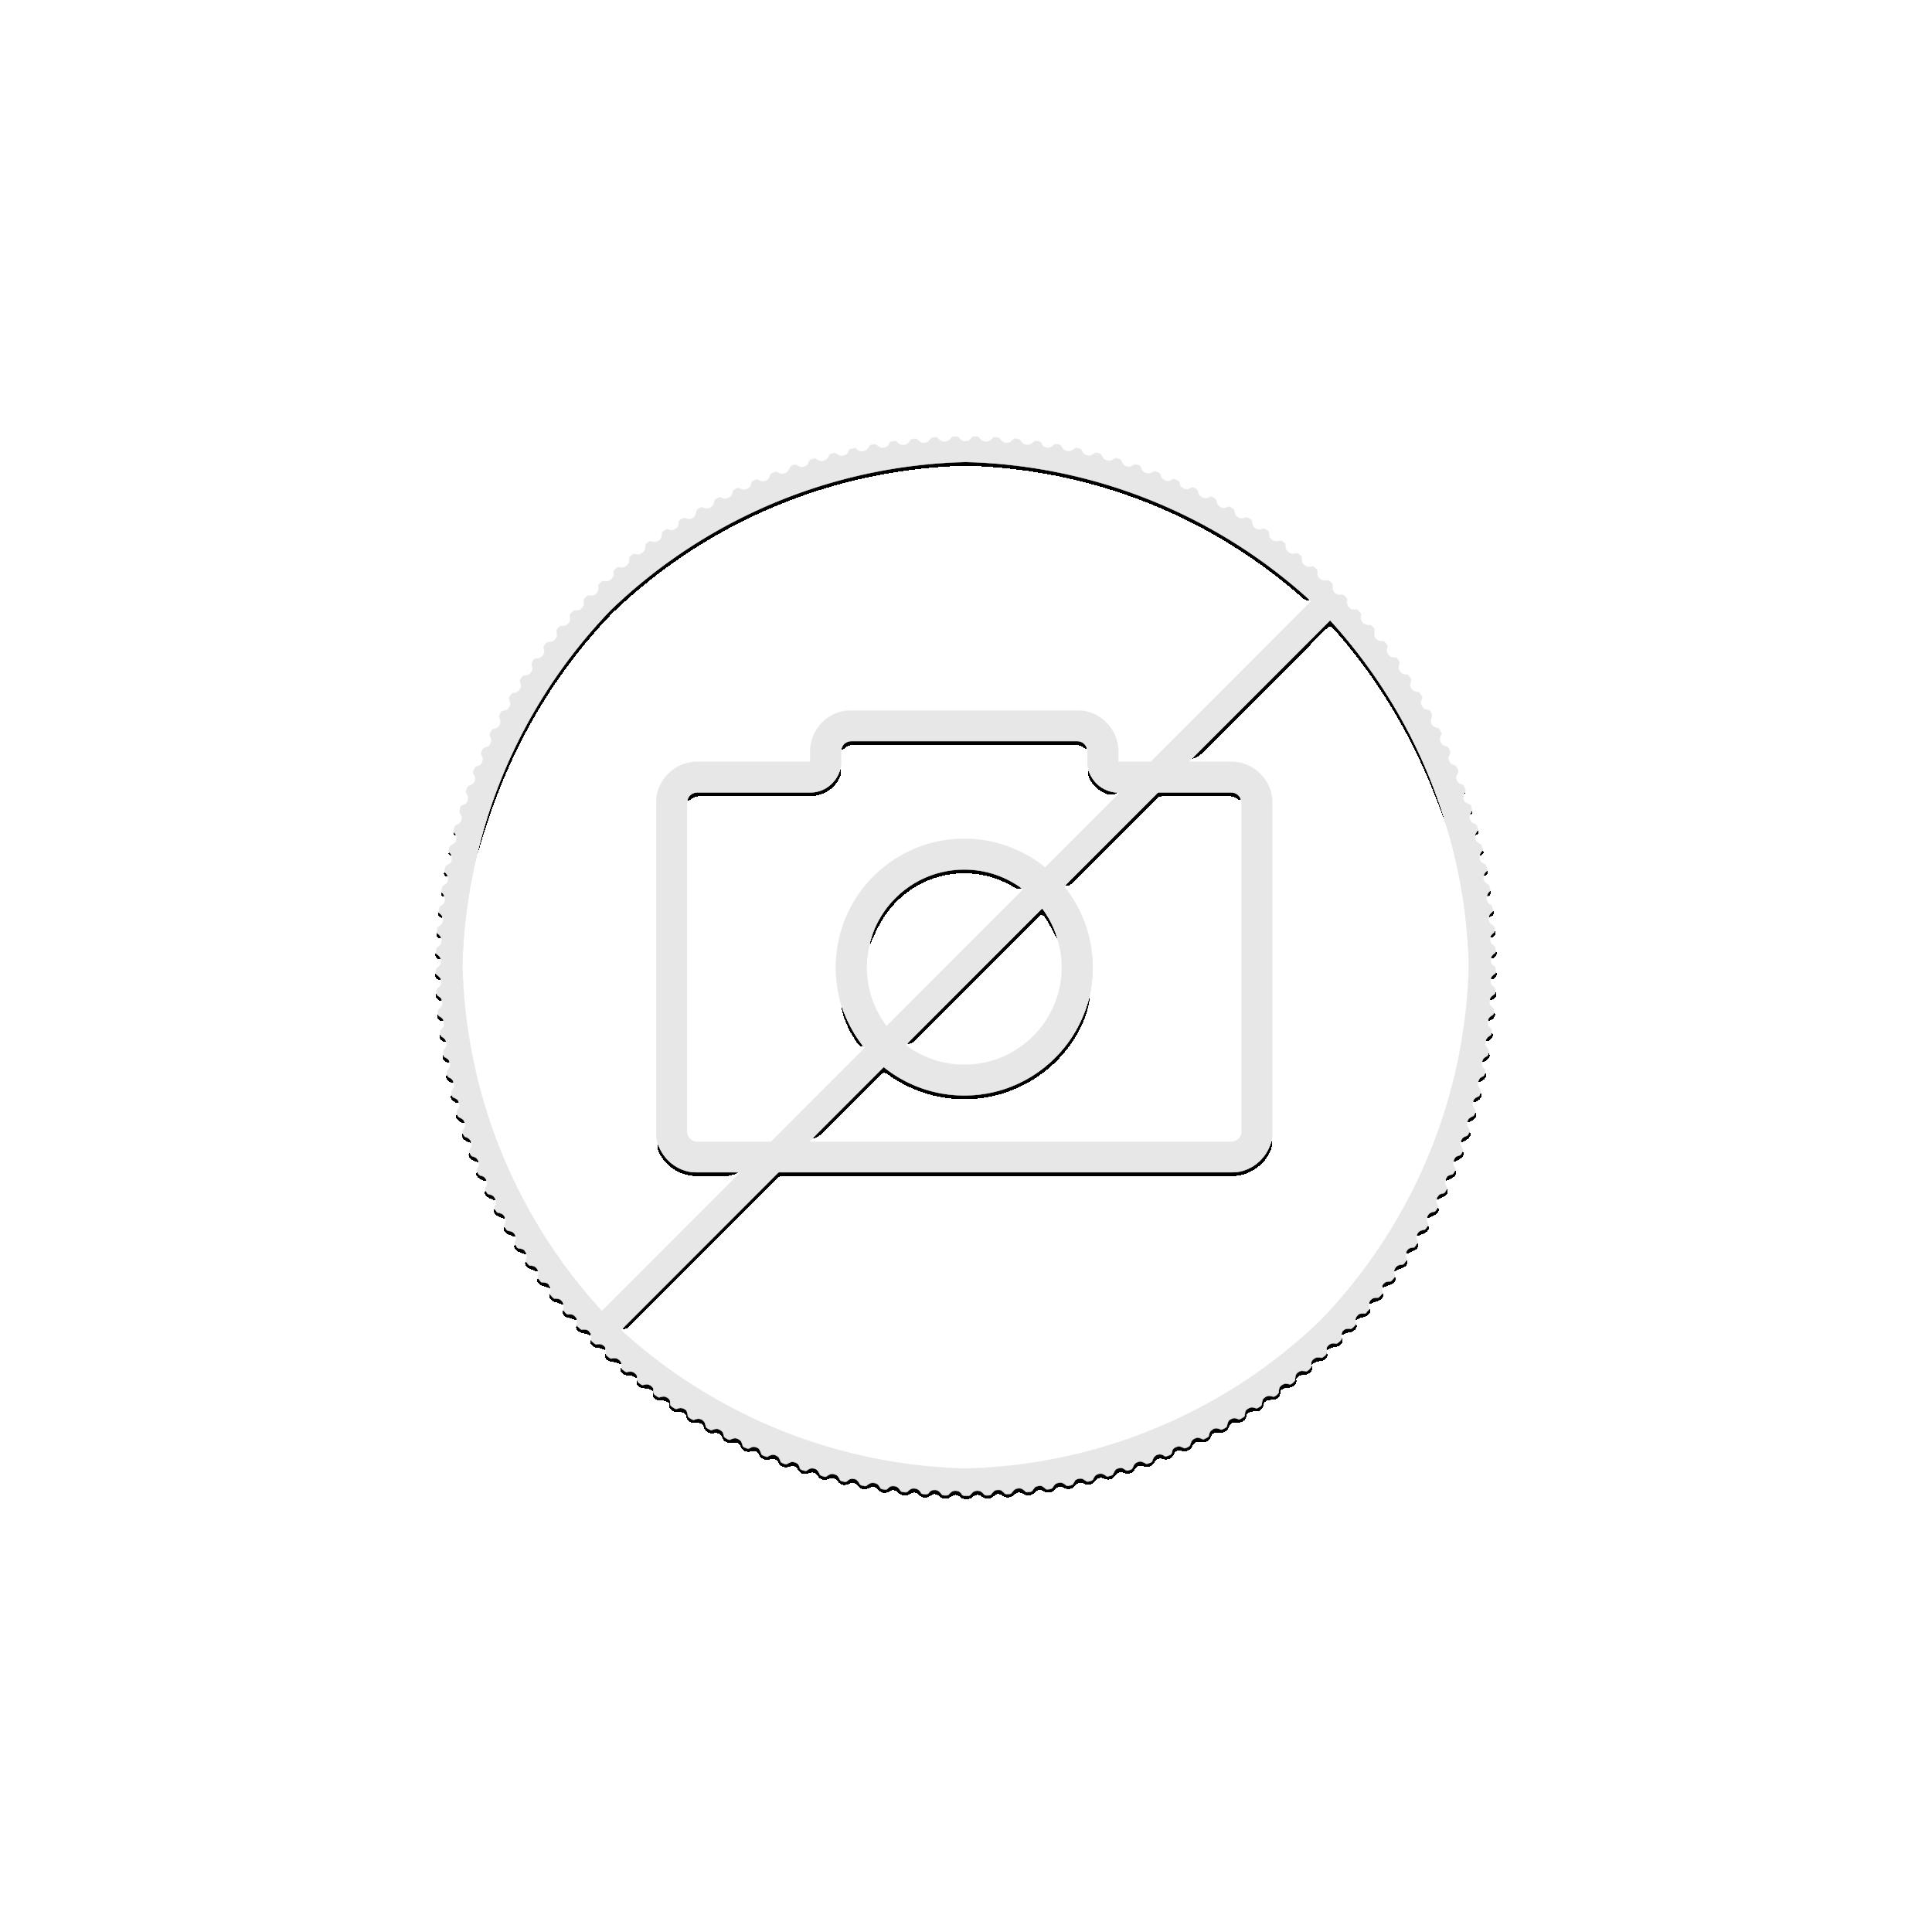 2 oz zilveren munt Qi Lin Unicorn antieke afwerking 2018 - box